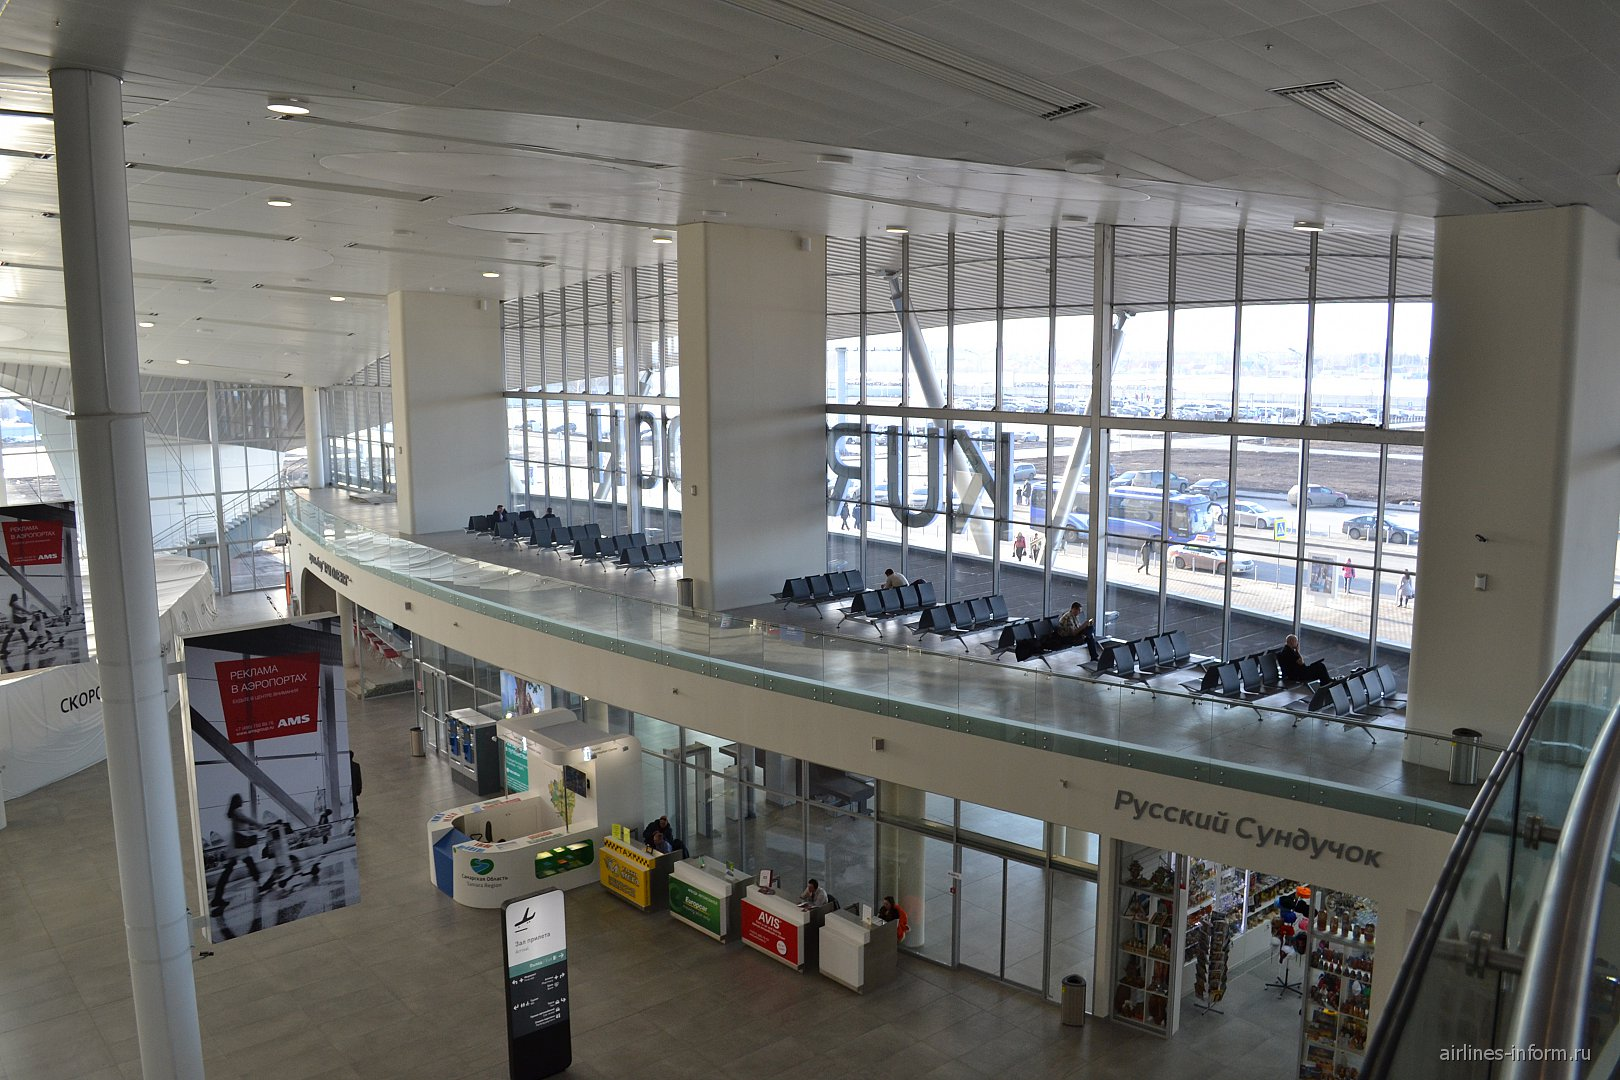 Вид с 3-го этажа терминала 1 аэропорта Самара Курумоч